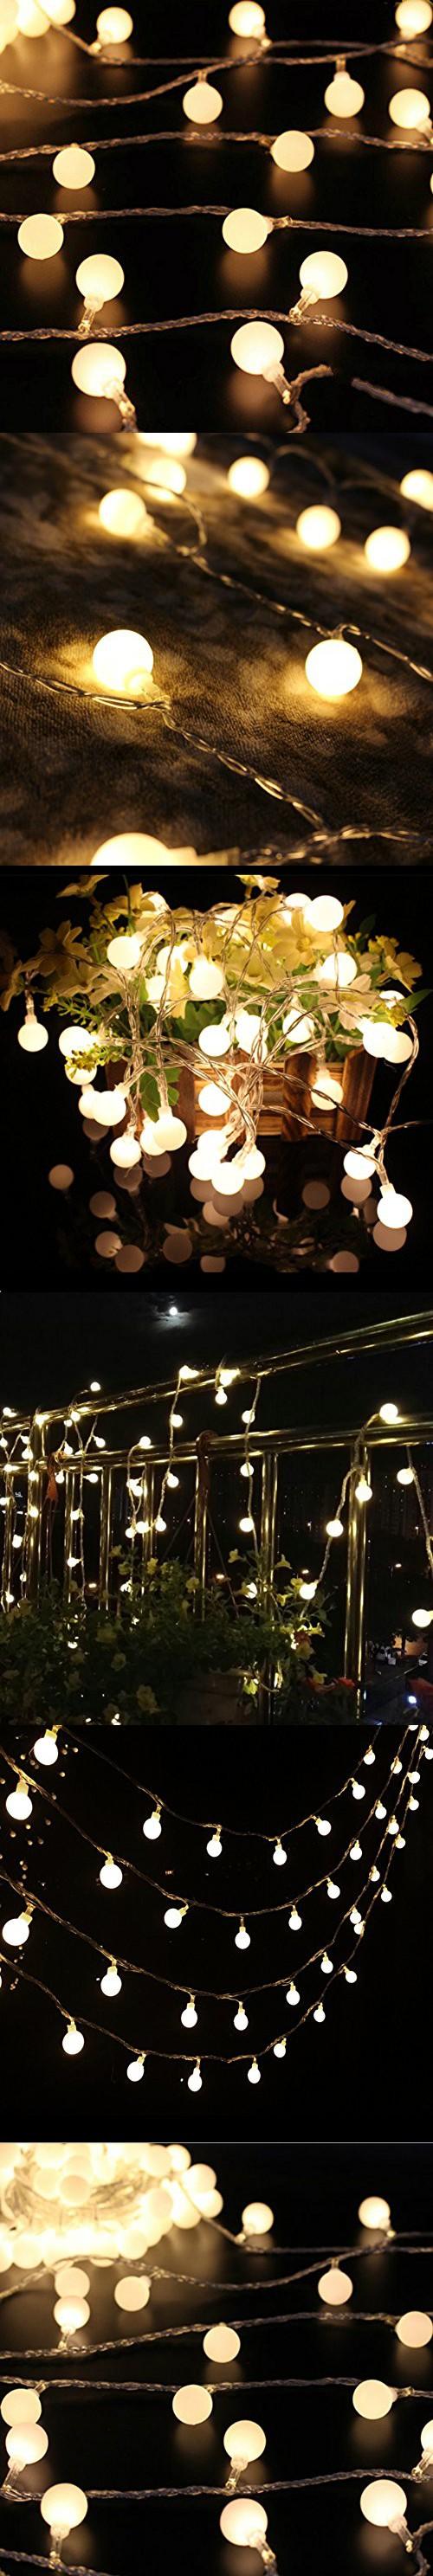 50 Leds 16 Feet Globe LED String Lights Starry Light Decorative for Gardens, Home, Wedding, Christmas Party (Warm White)